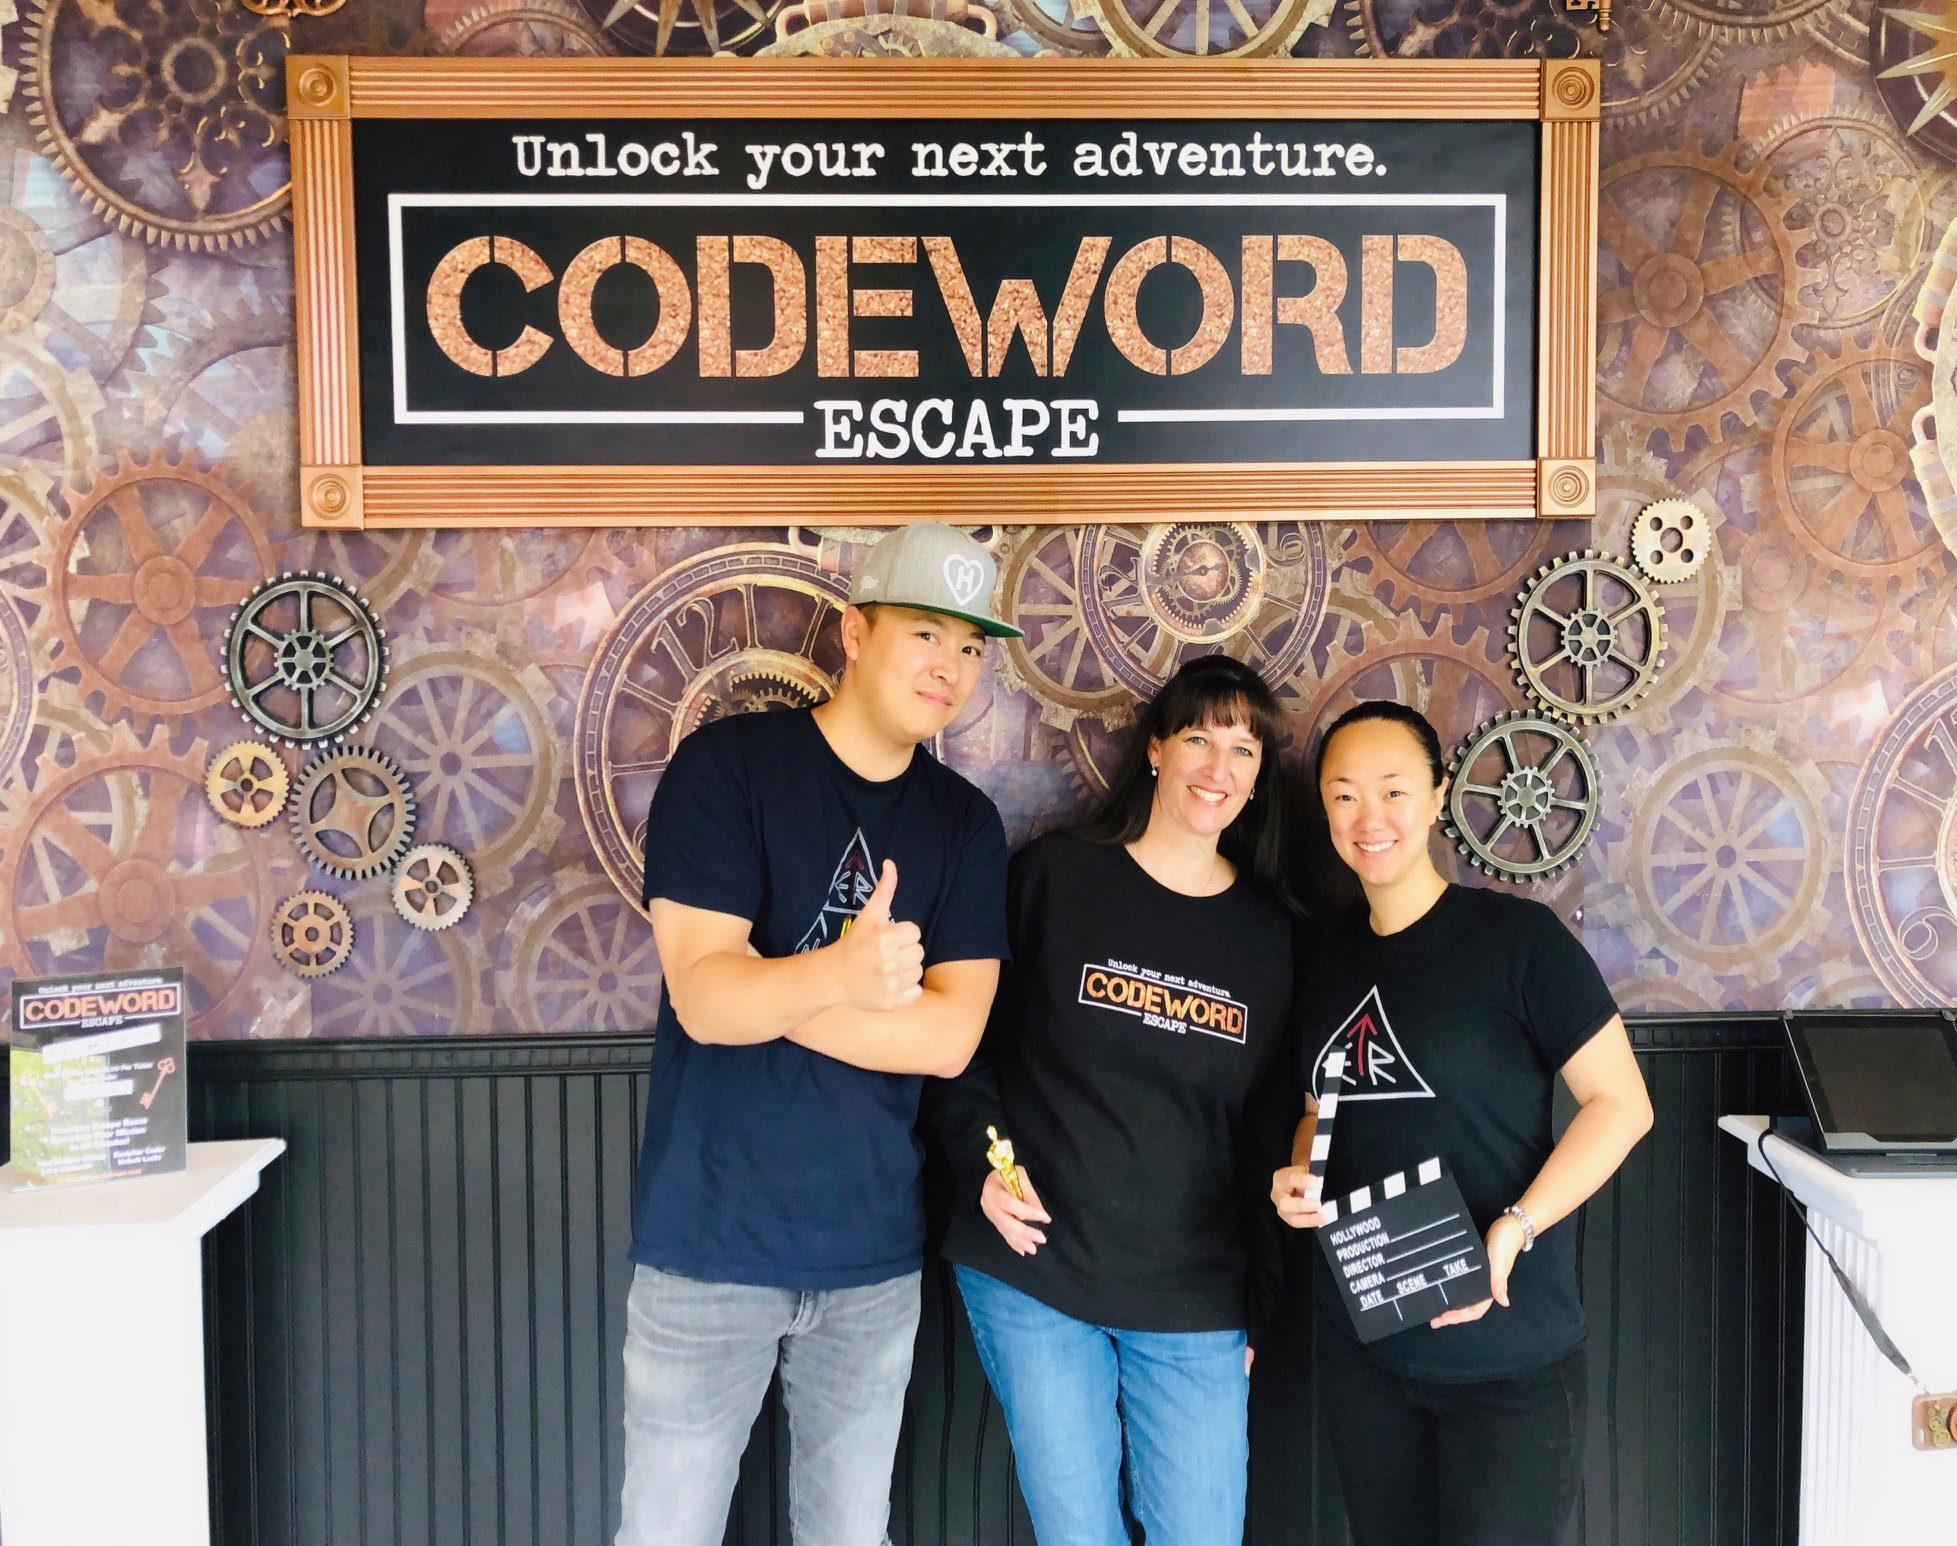 Codeword Escape